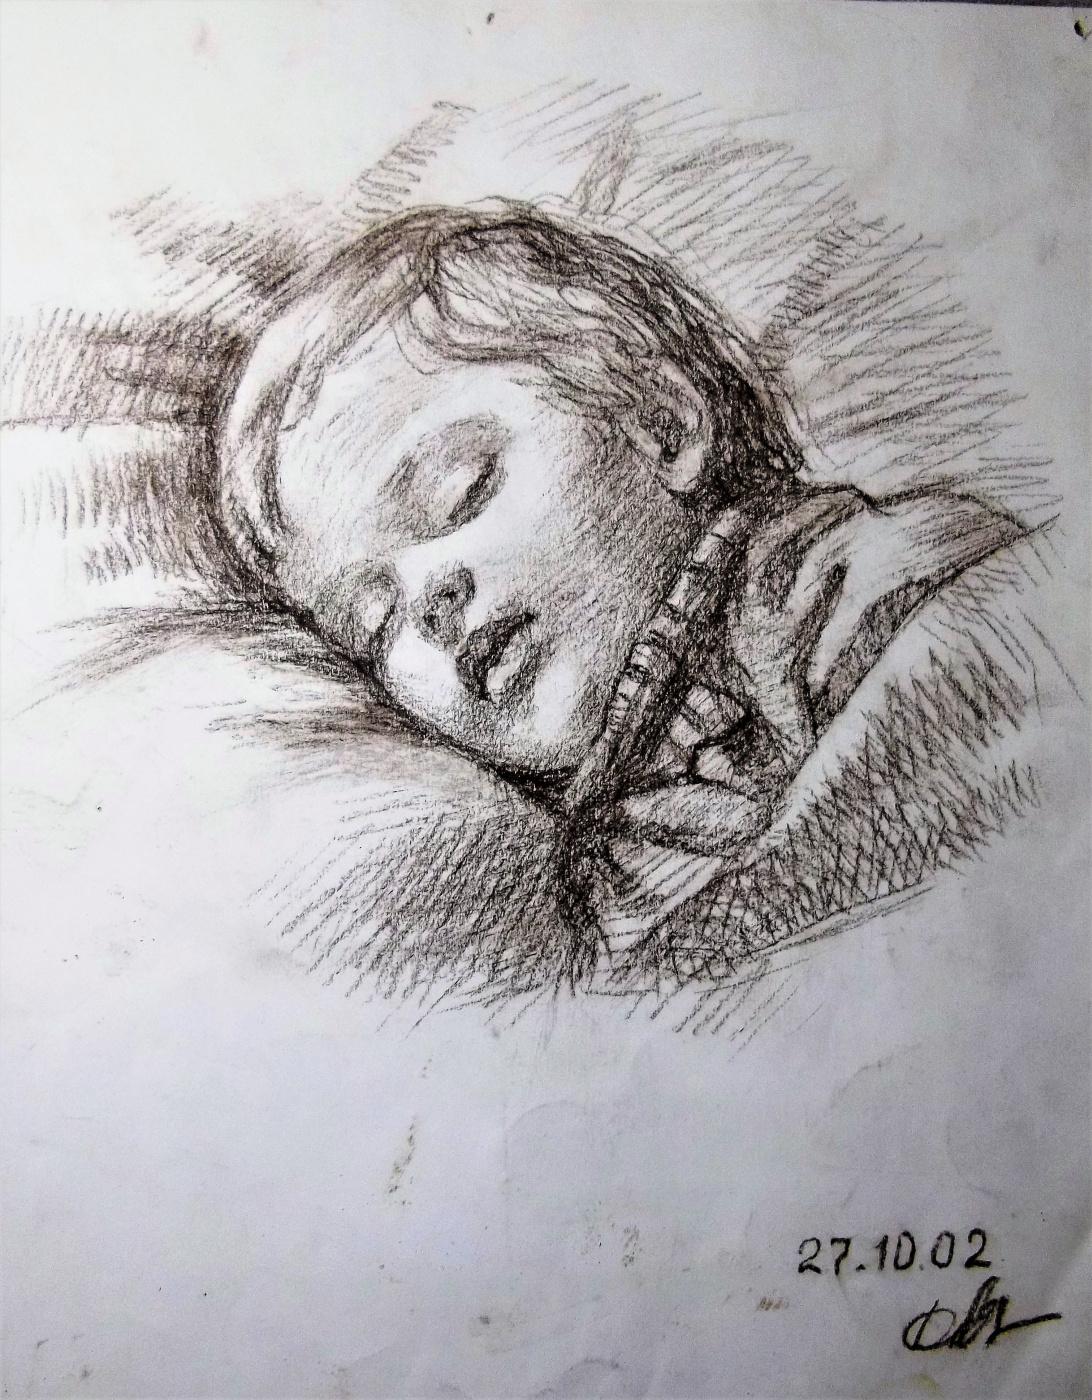 Ruslan Vasilievich Derevtsov. Sleeping Andryusha. (2002)